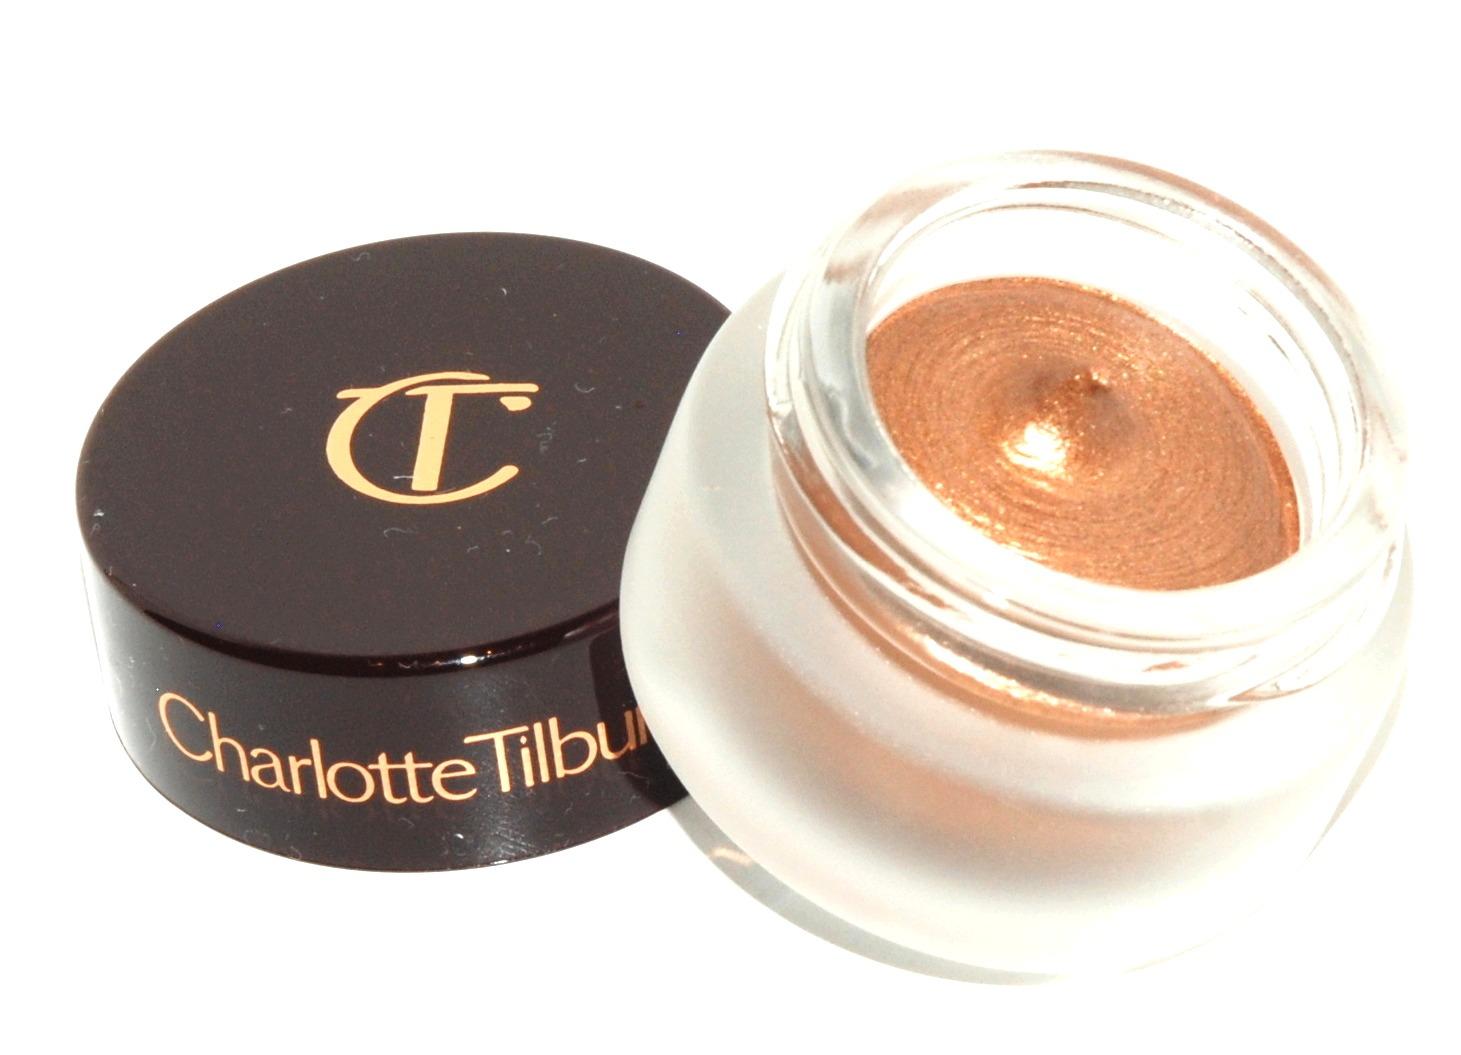 Charlotte Tilbury Eyeshadow